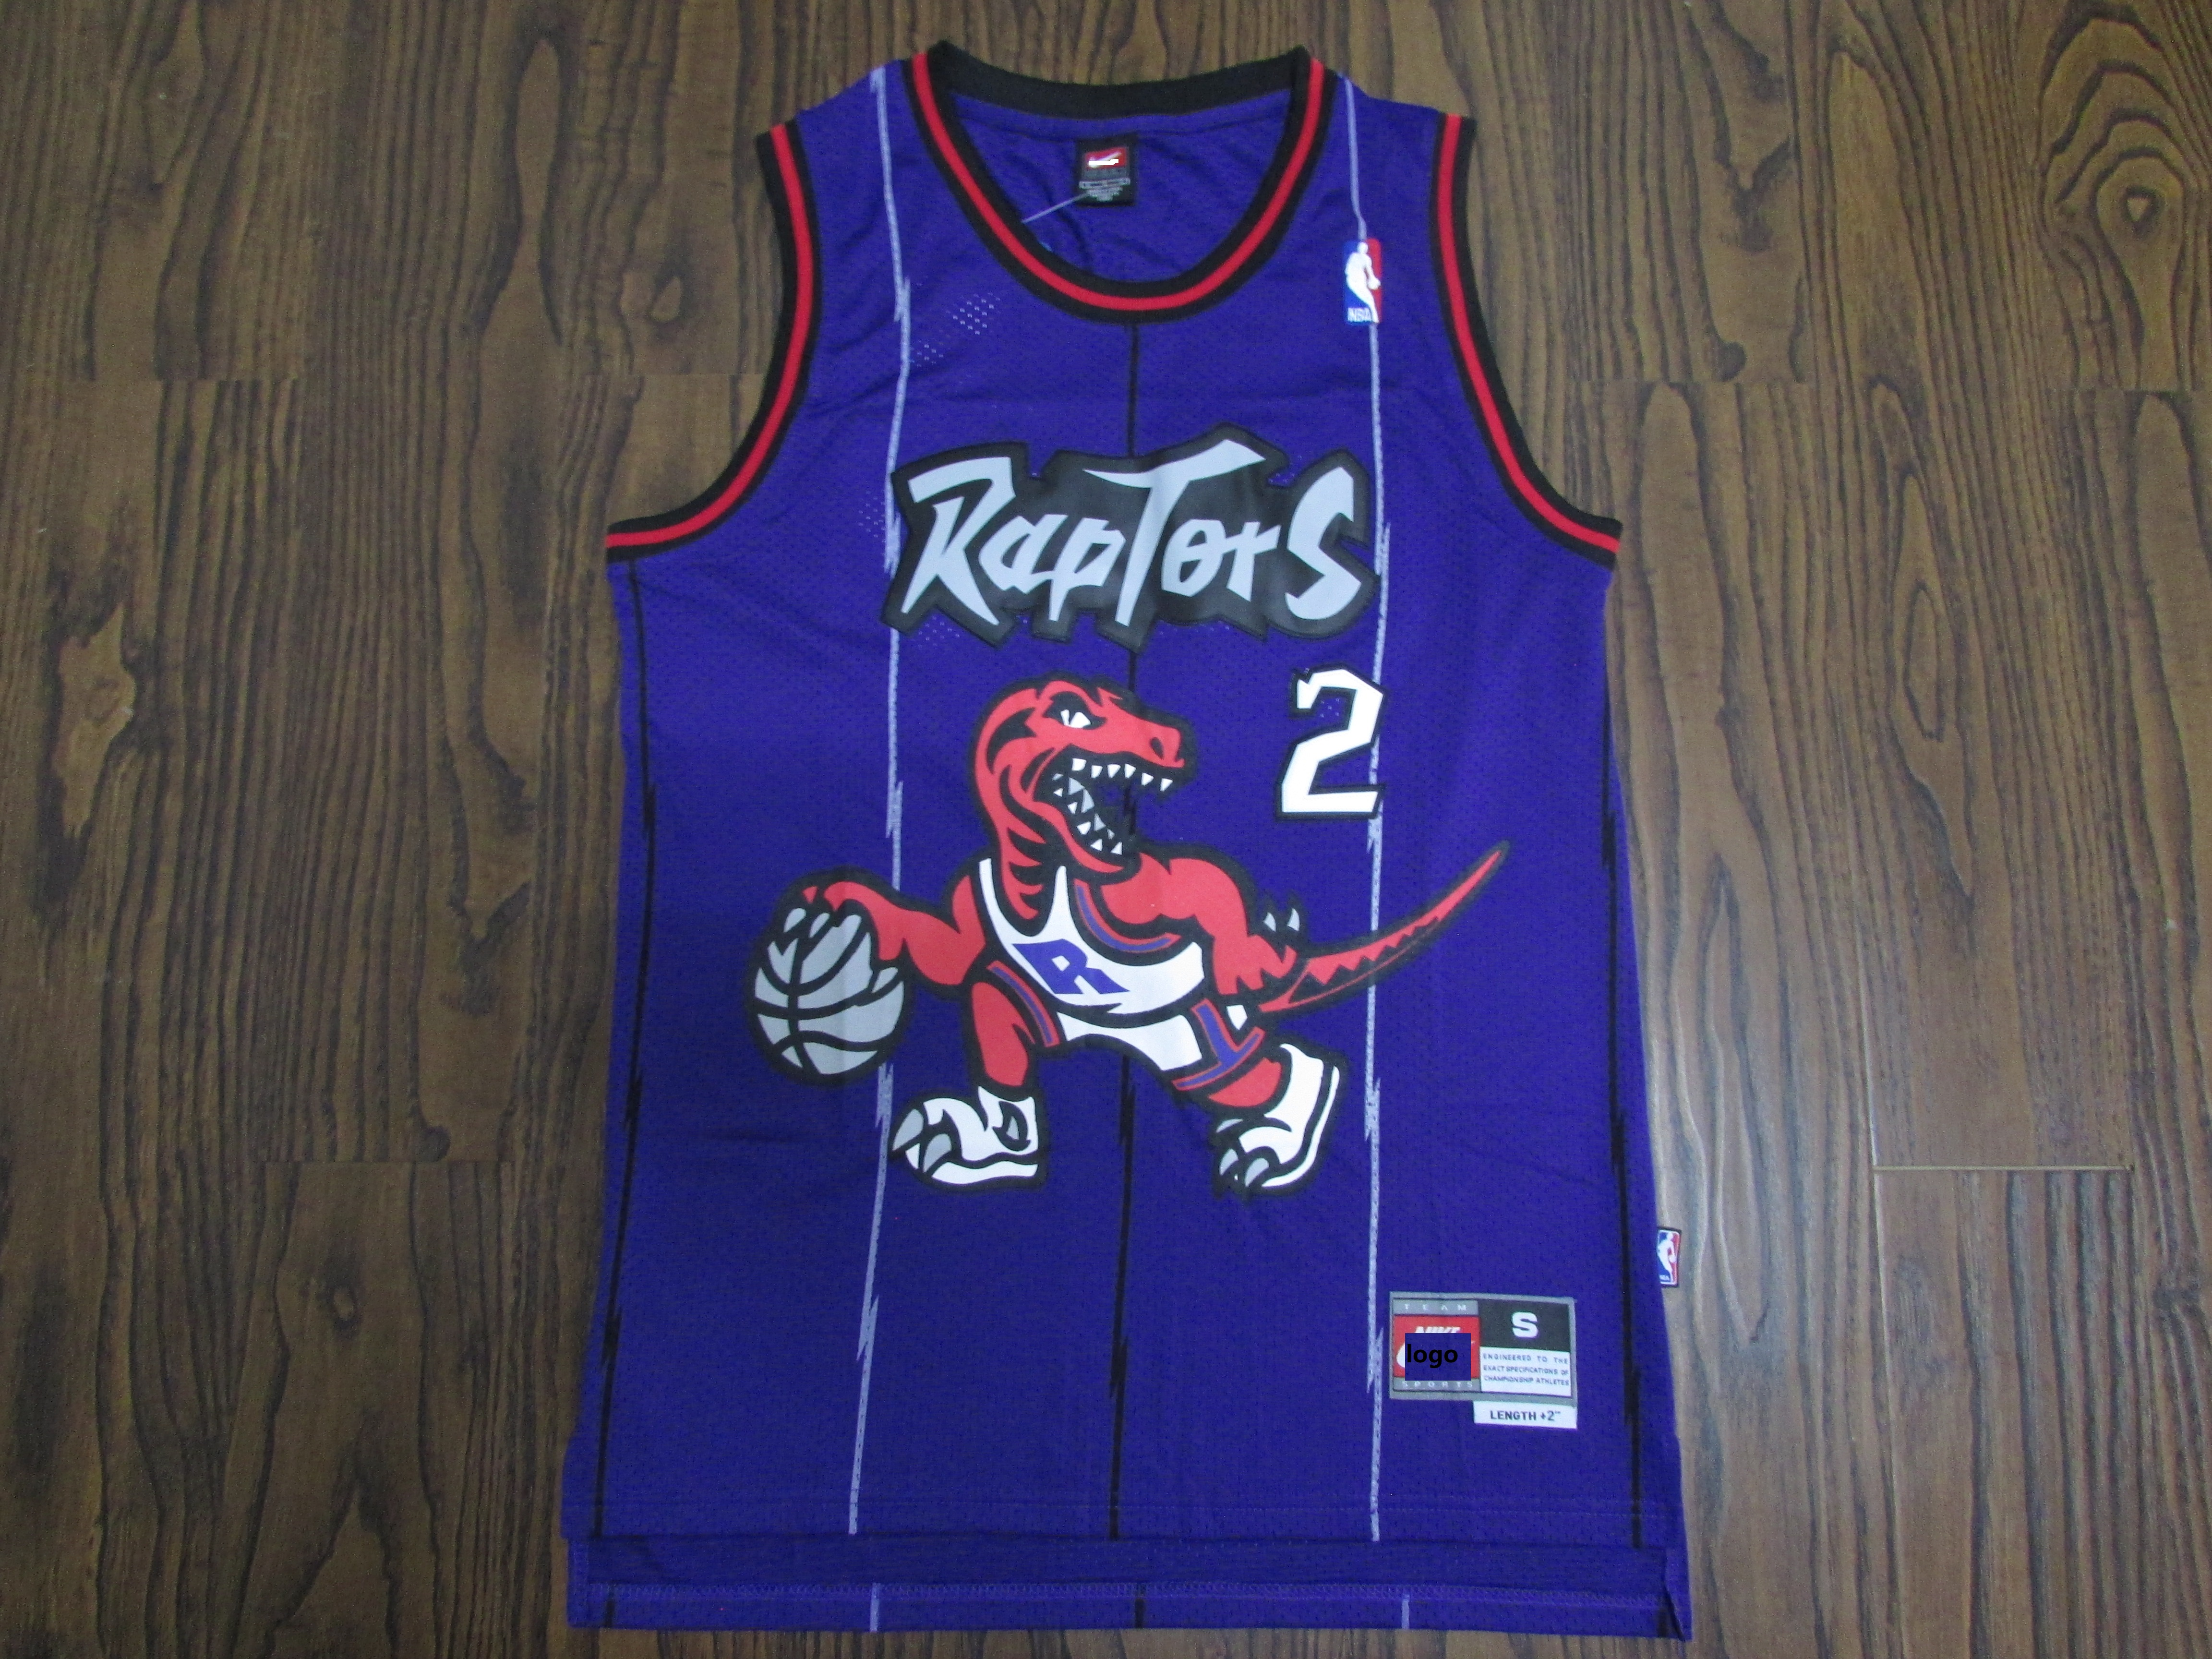 19/20 Men Raptors basketball jersey